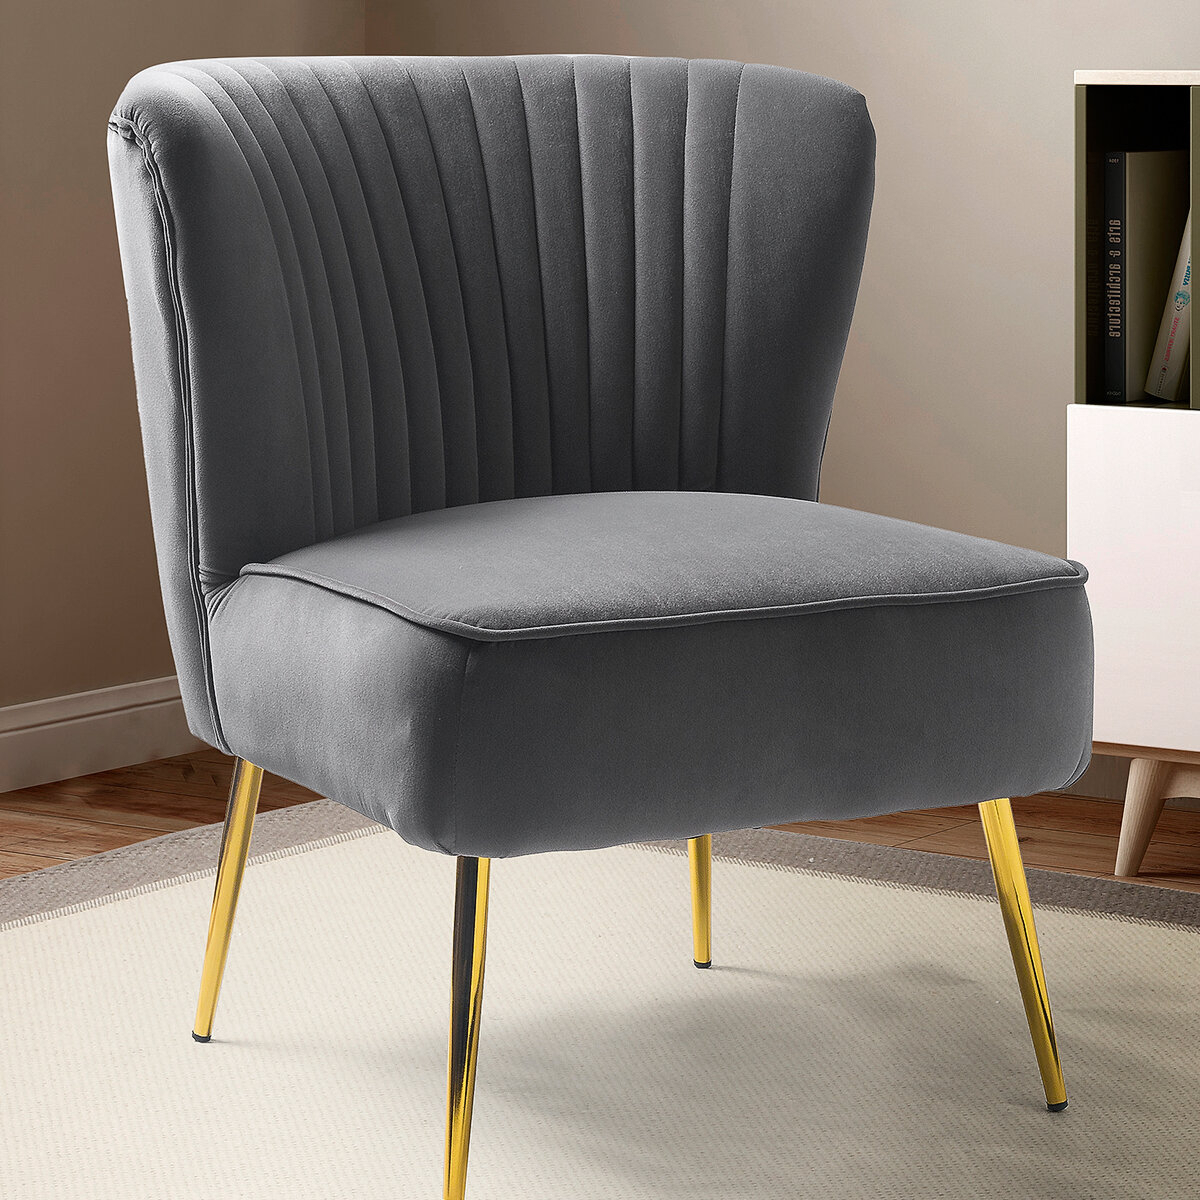 Grey & Yellow Accent Chairs You'Ll Love In 2021 | Wayfair Regarding Bernardston Armchairs (View 5 of 15)